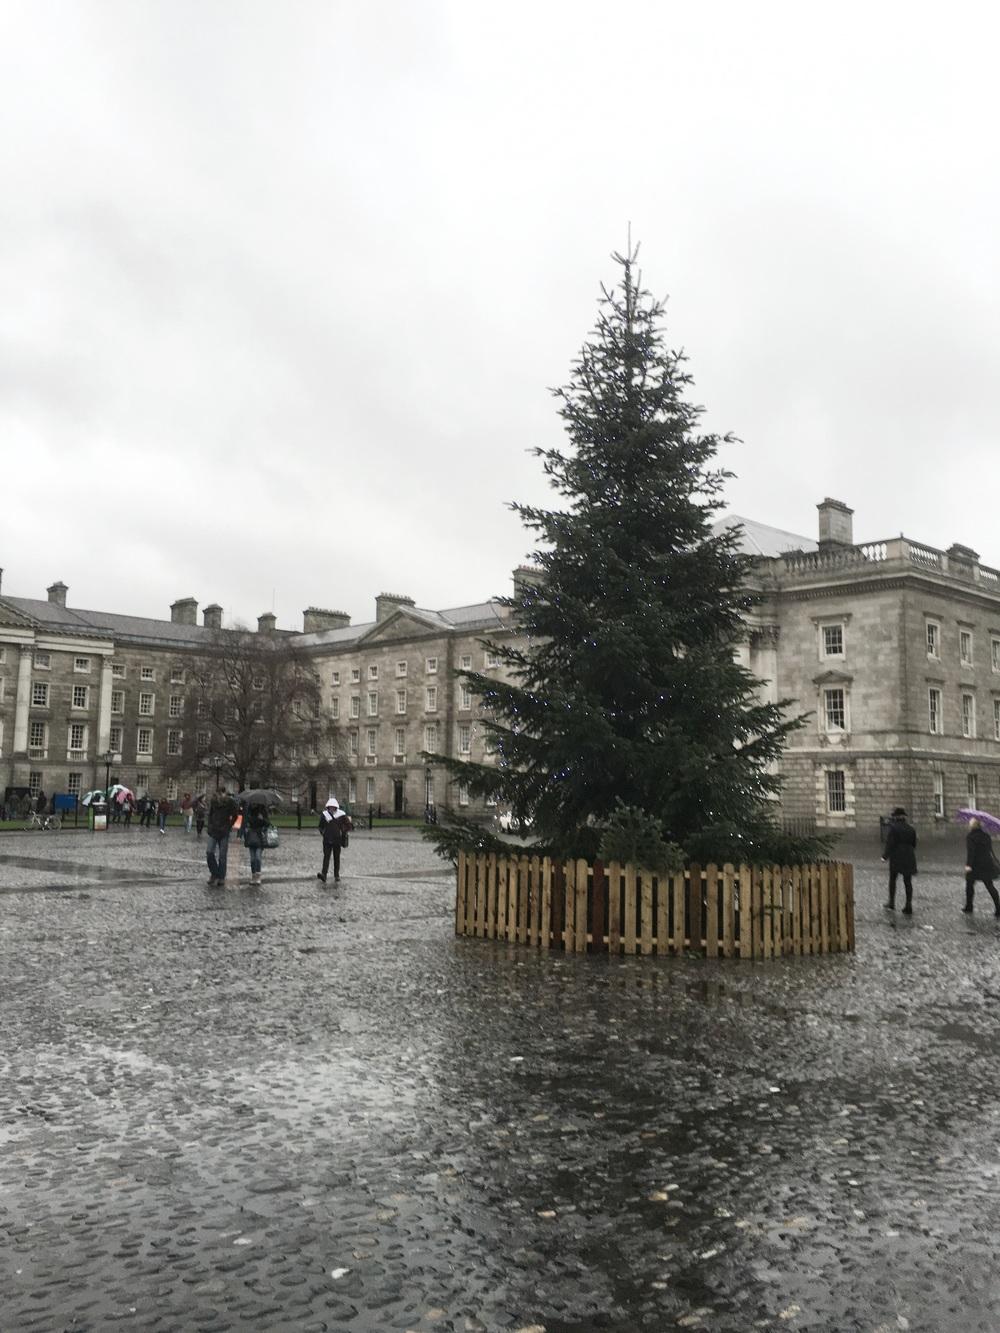 Dublin, Ireland (Trinity College)